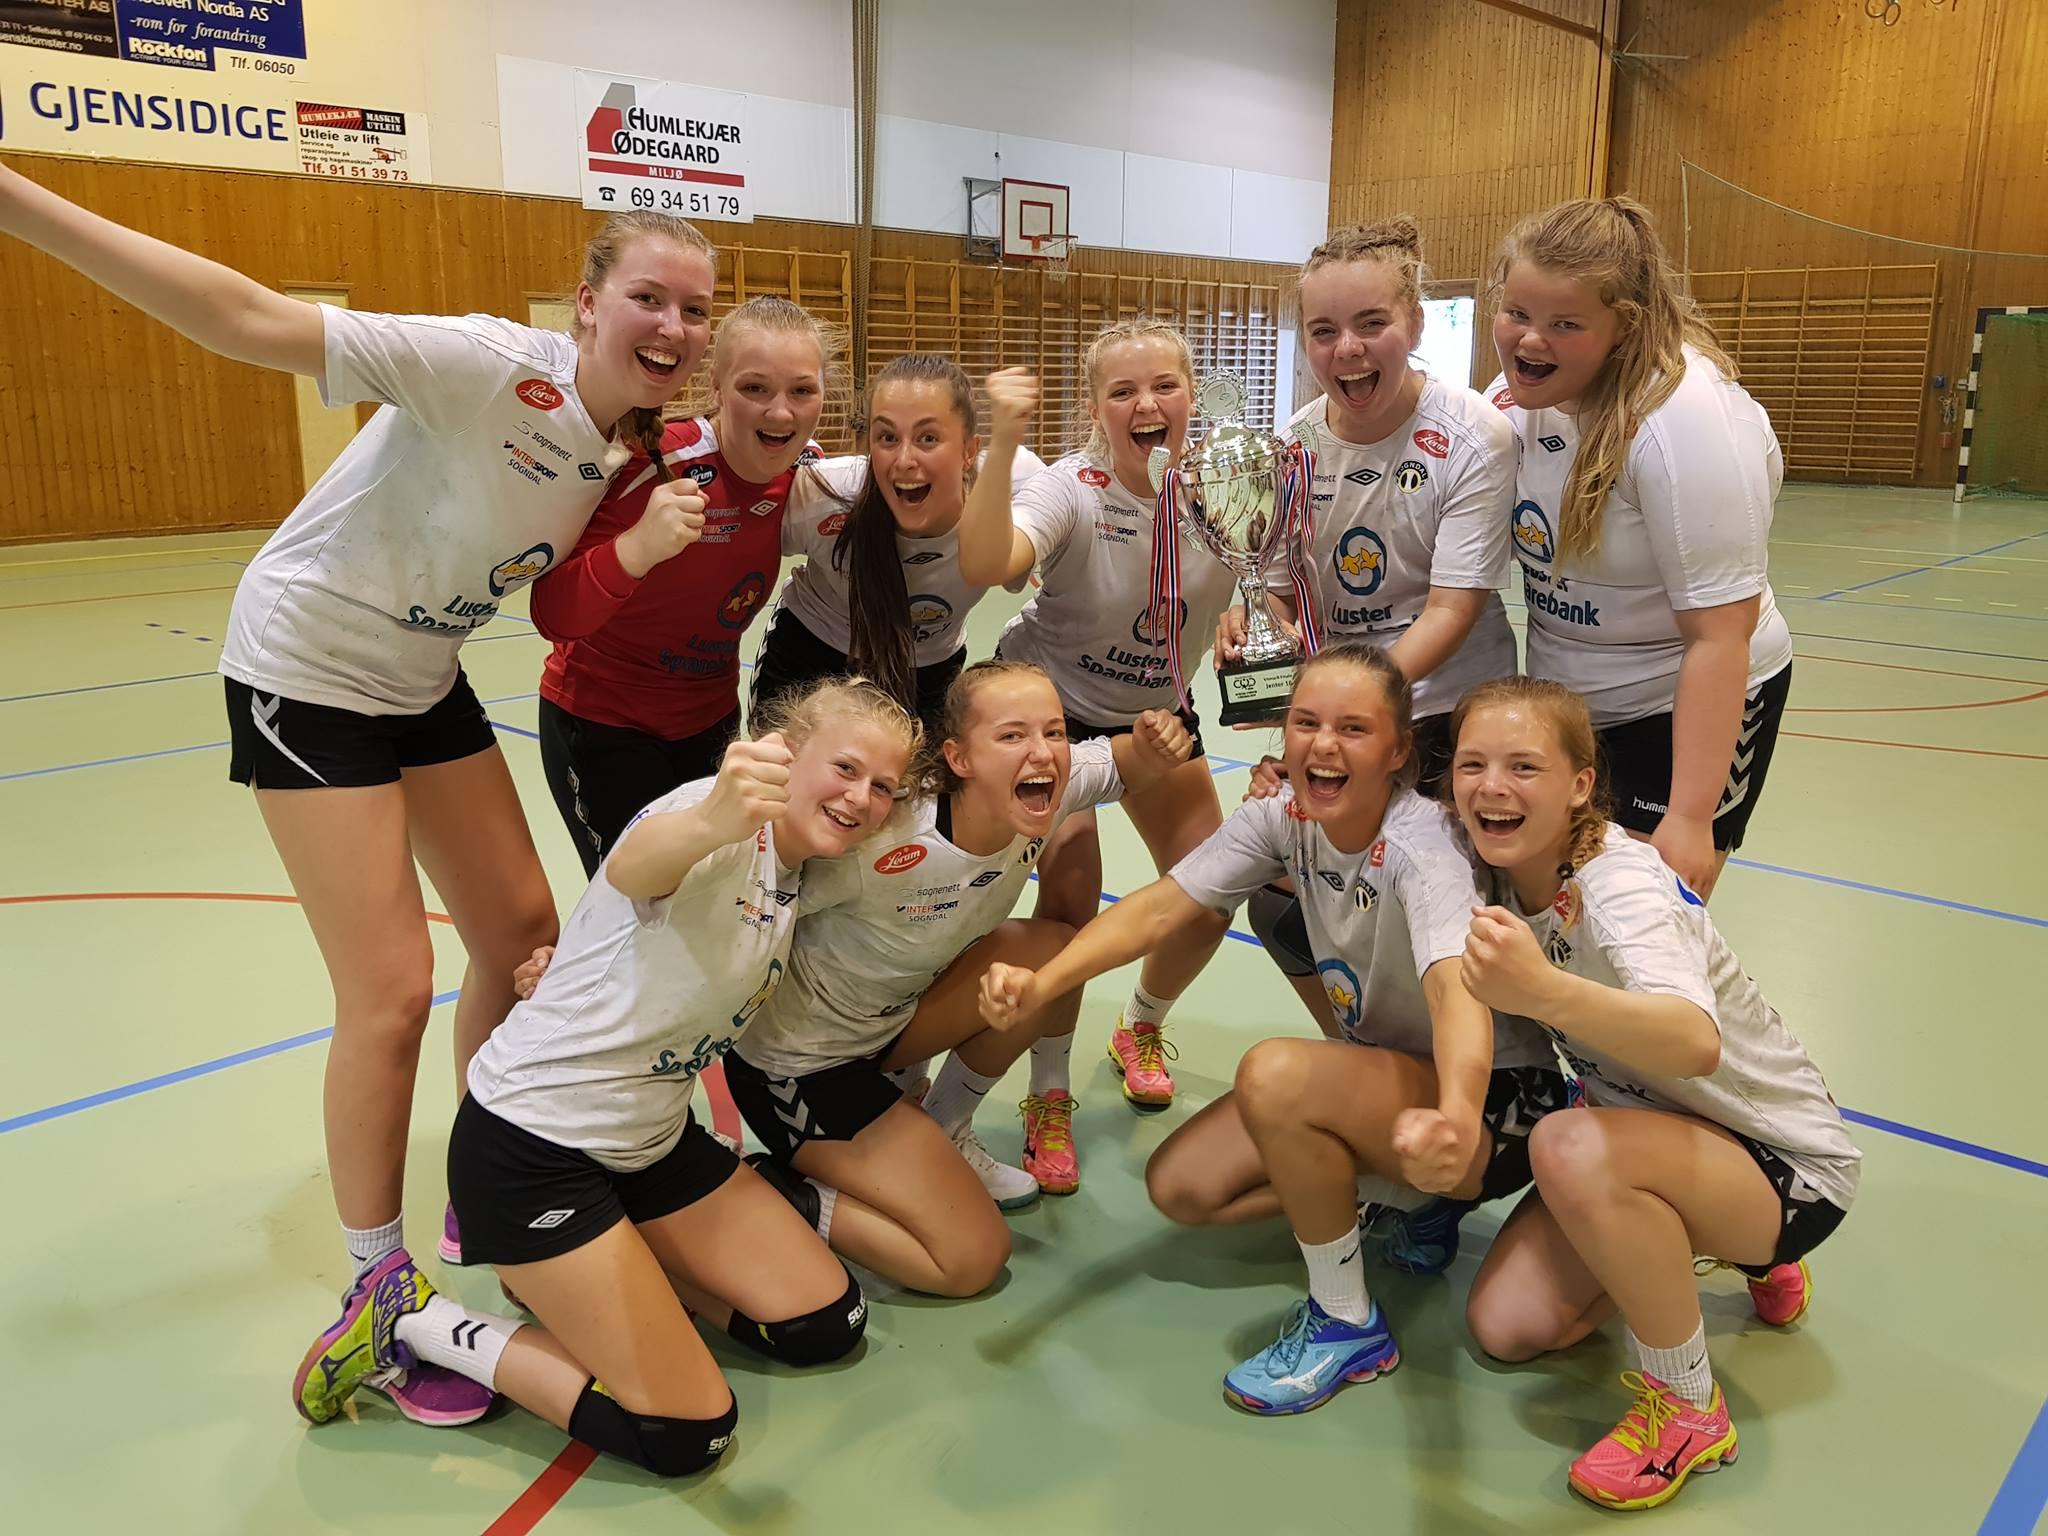 Handball og Lerum_110919.jpg